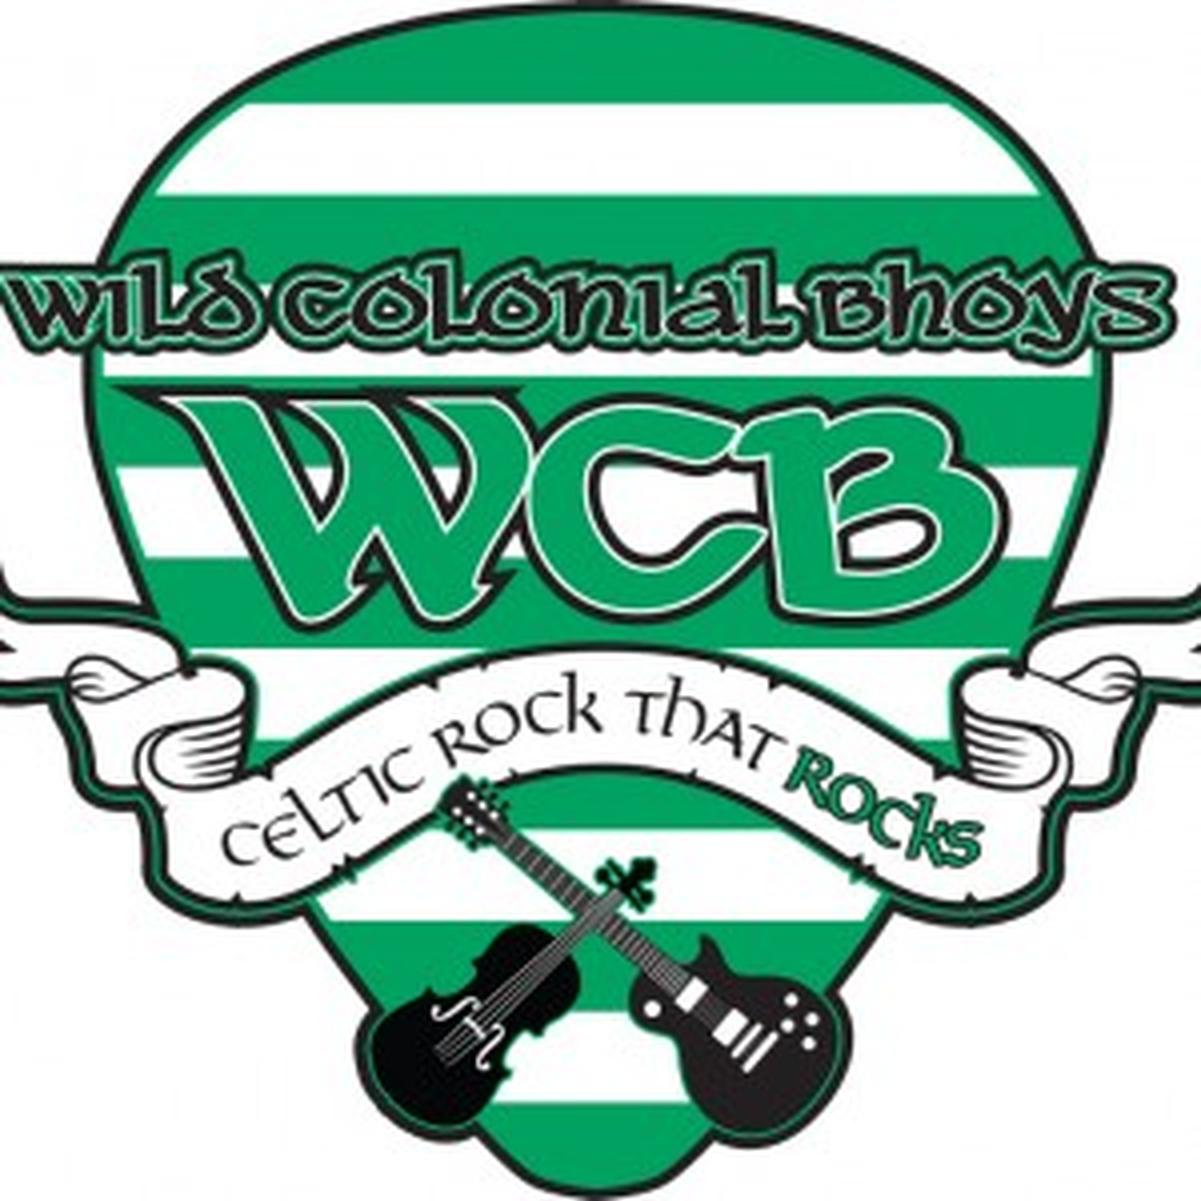 Wild Colonial Bhoys wiki, Wild Colonial Bhoys review, Wild Colonial Bhoys history, Wild Colonial Bhoys news